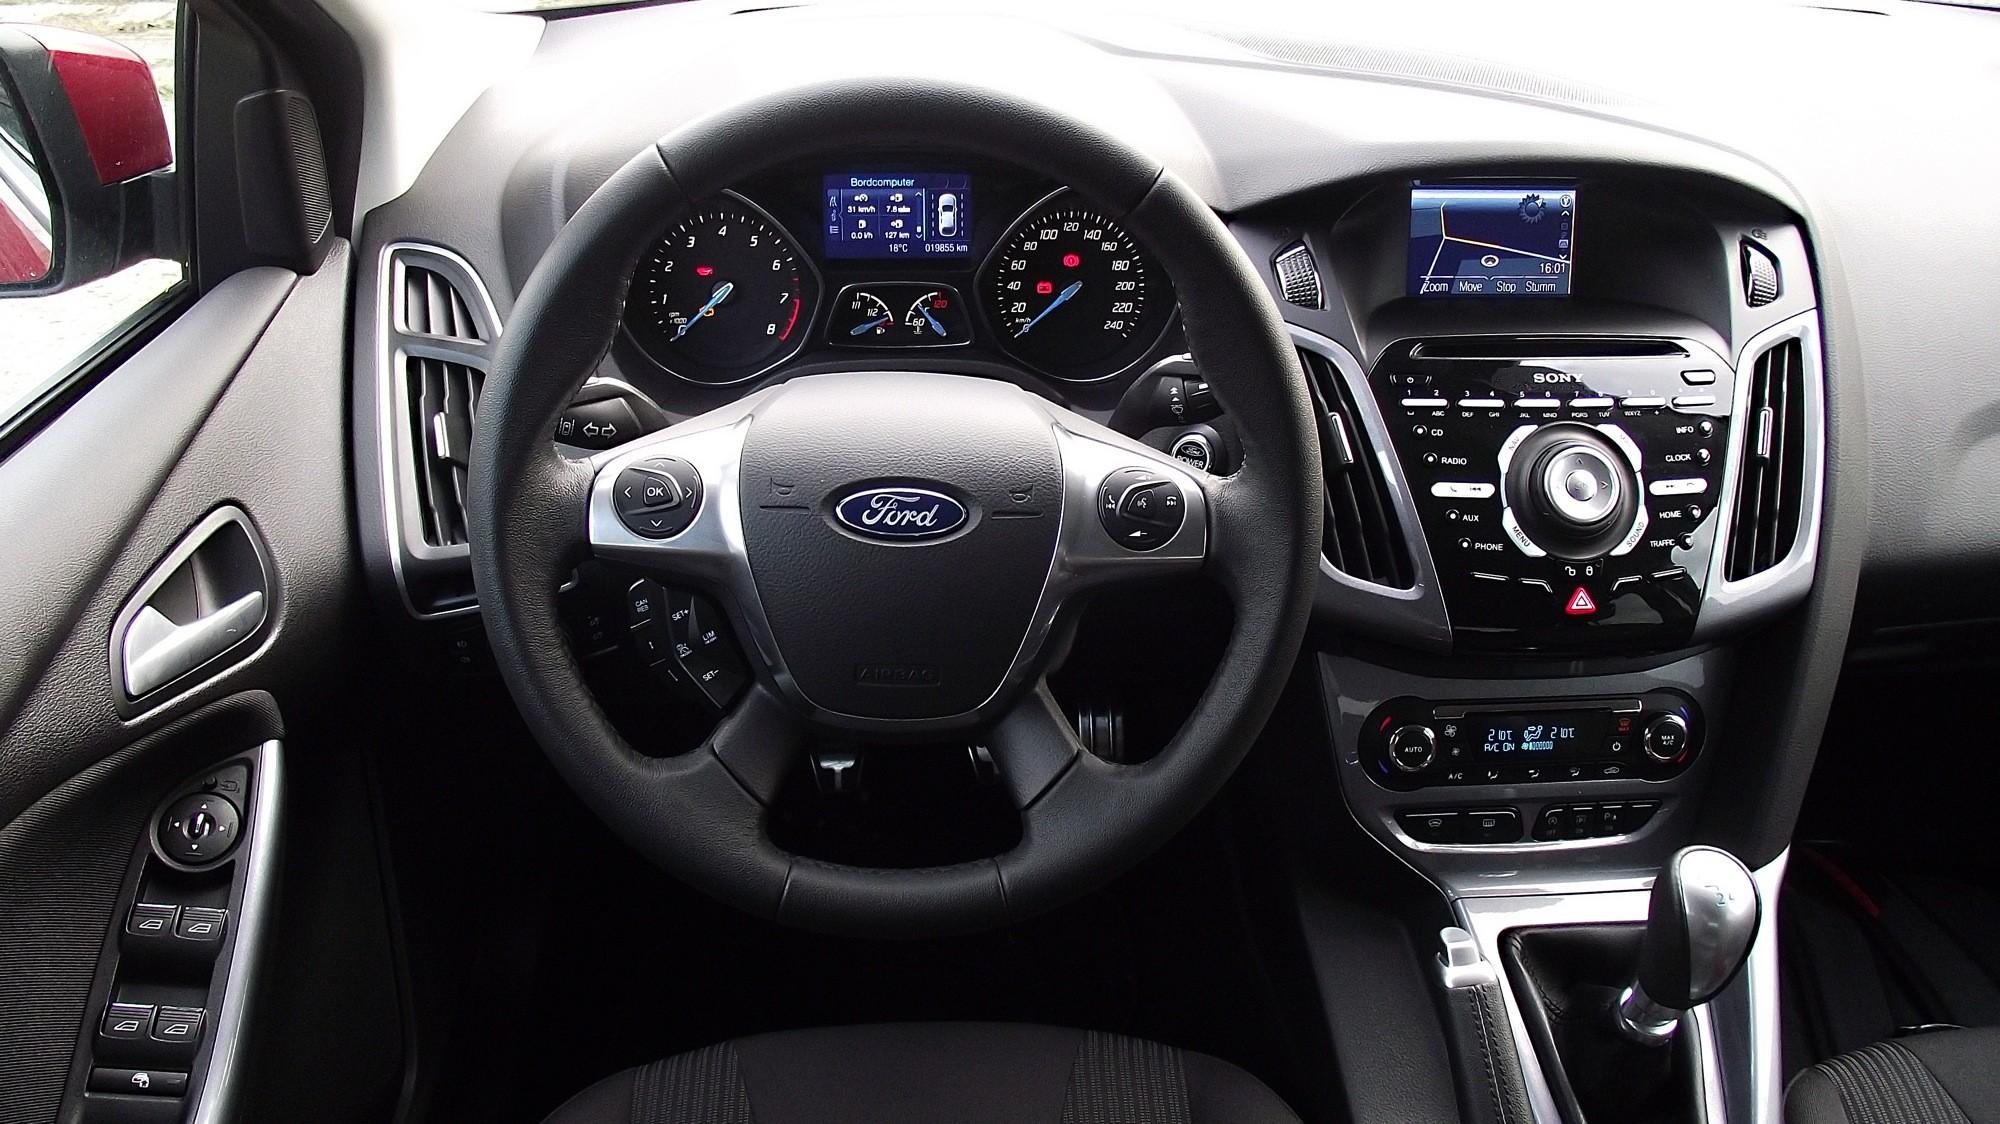 Llega el nuevo Ford Fiesta 2017